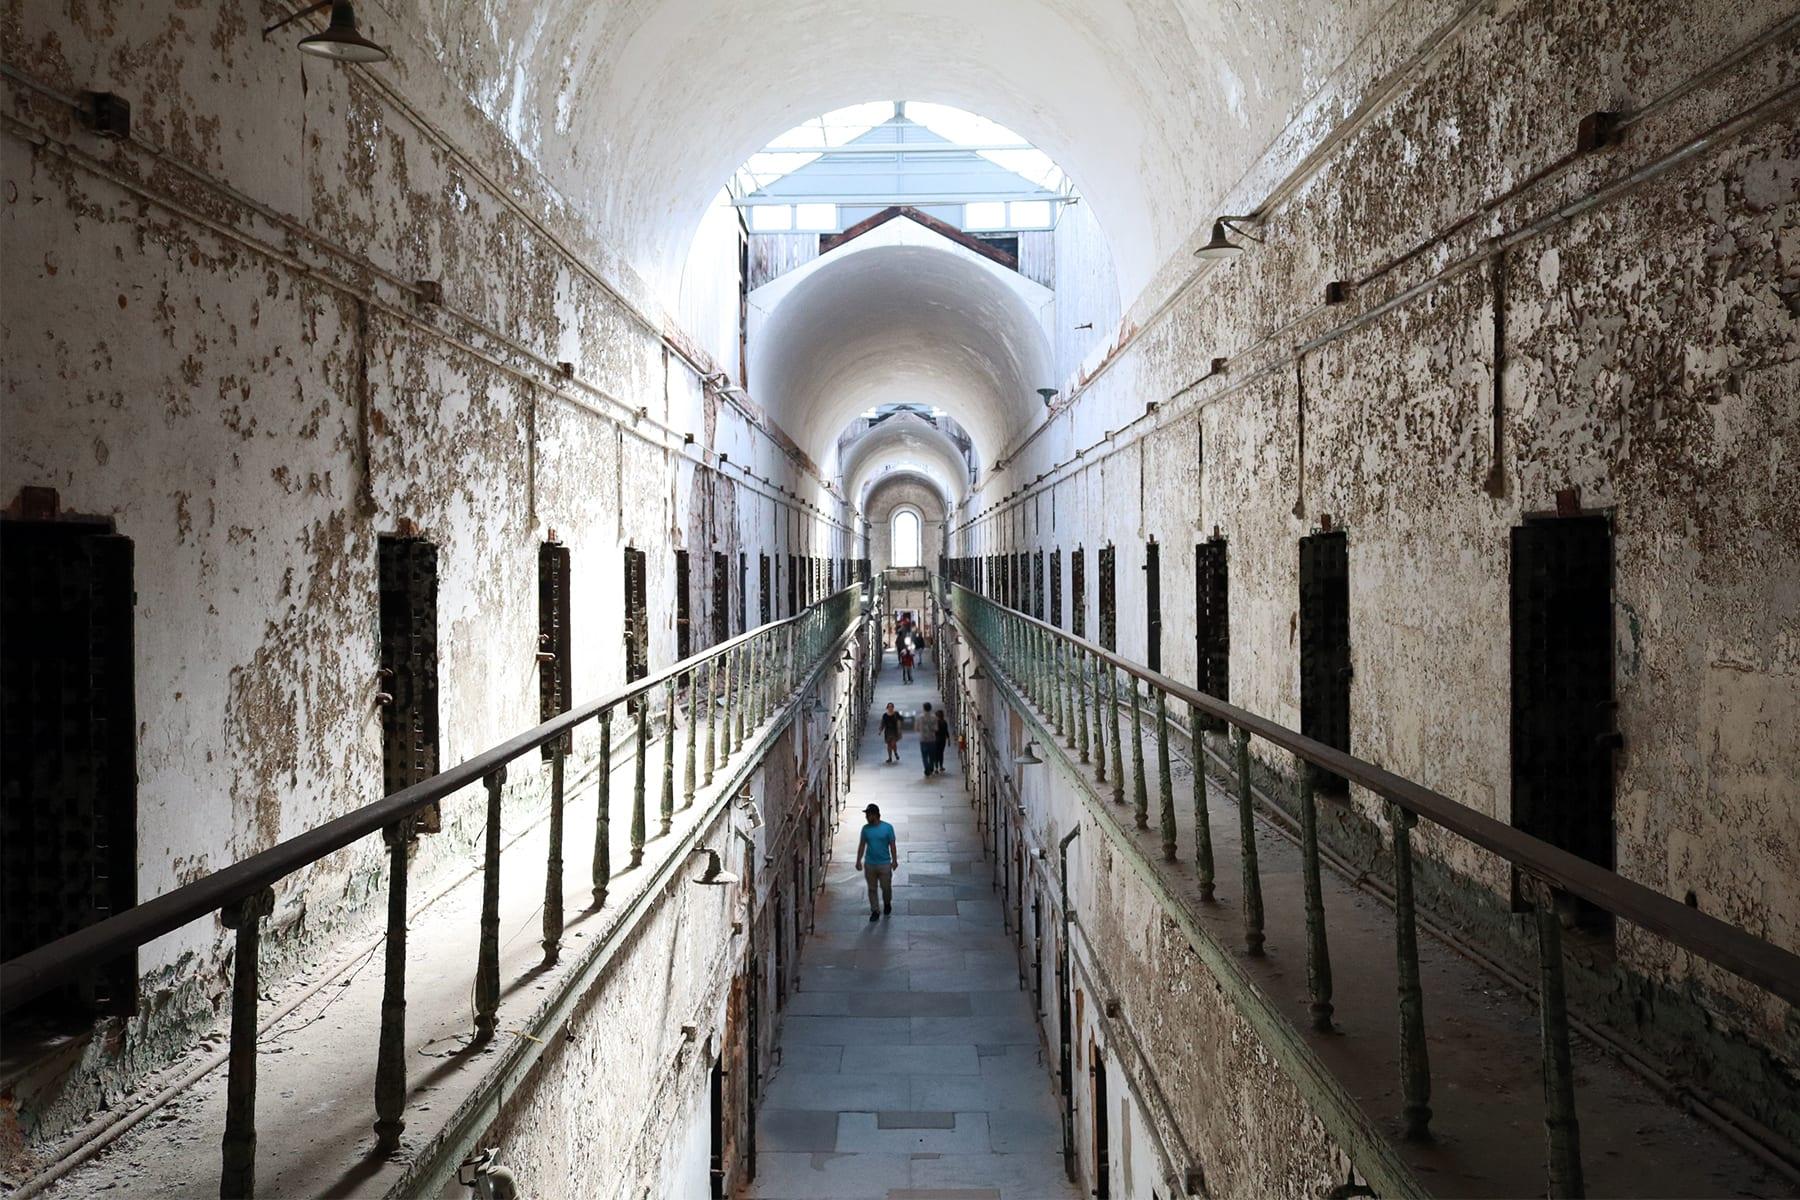 06-PA-journey03-prison01.jpg